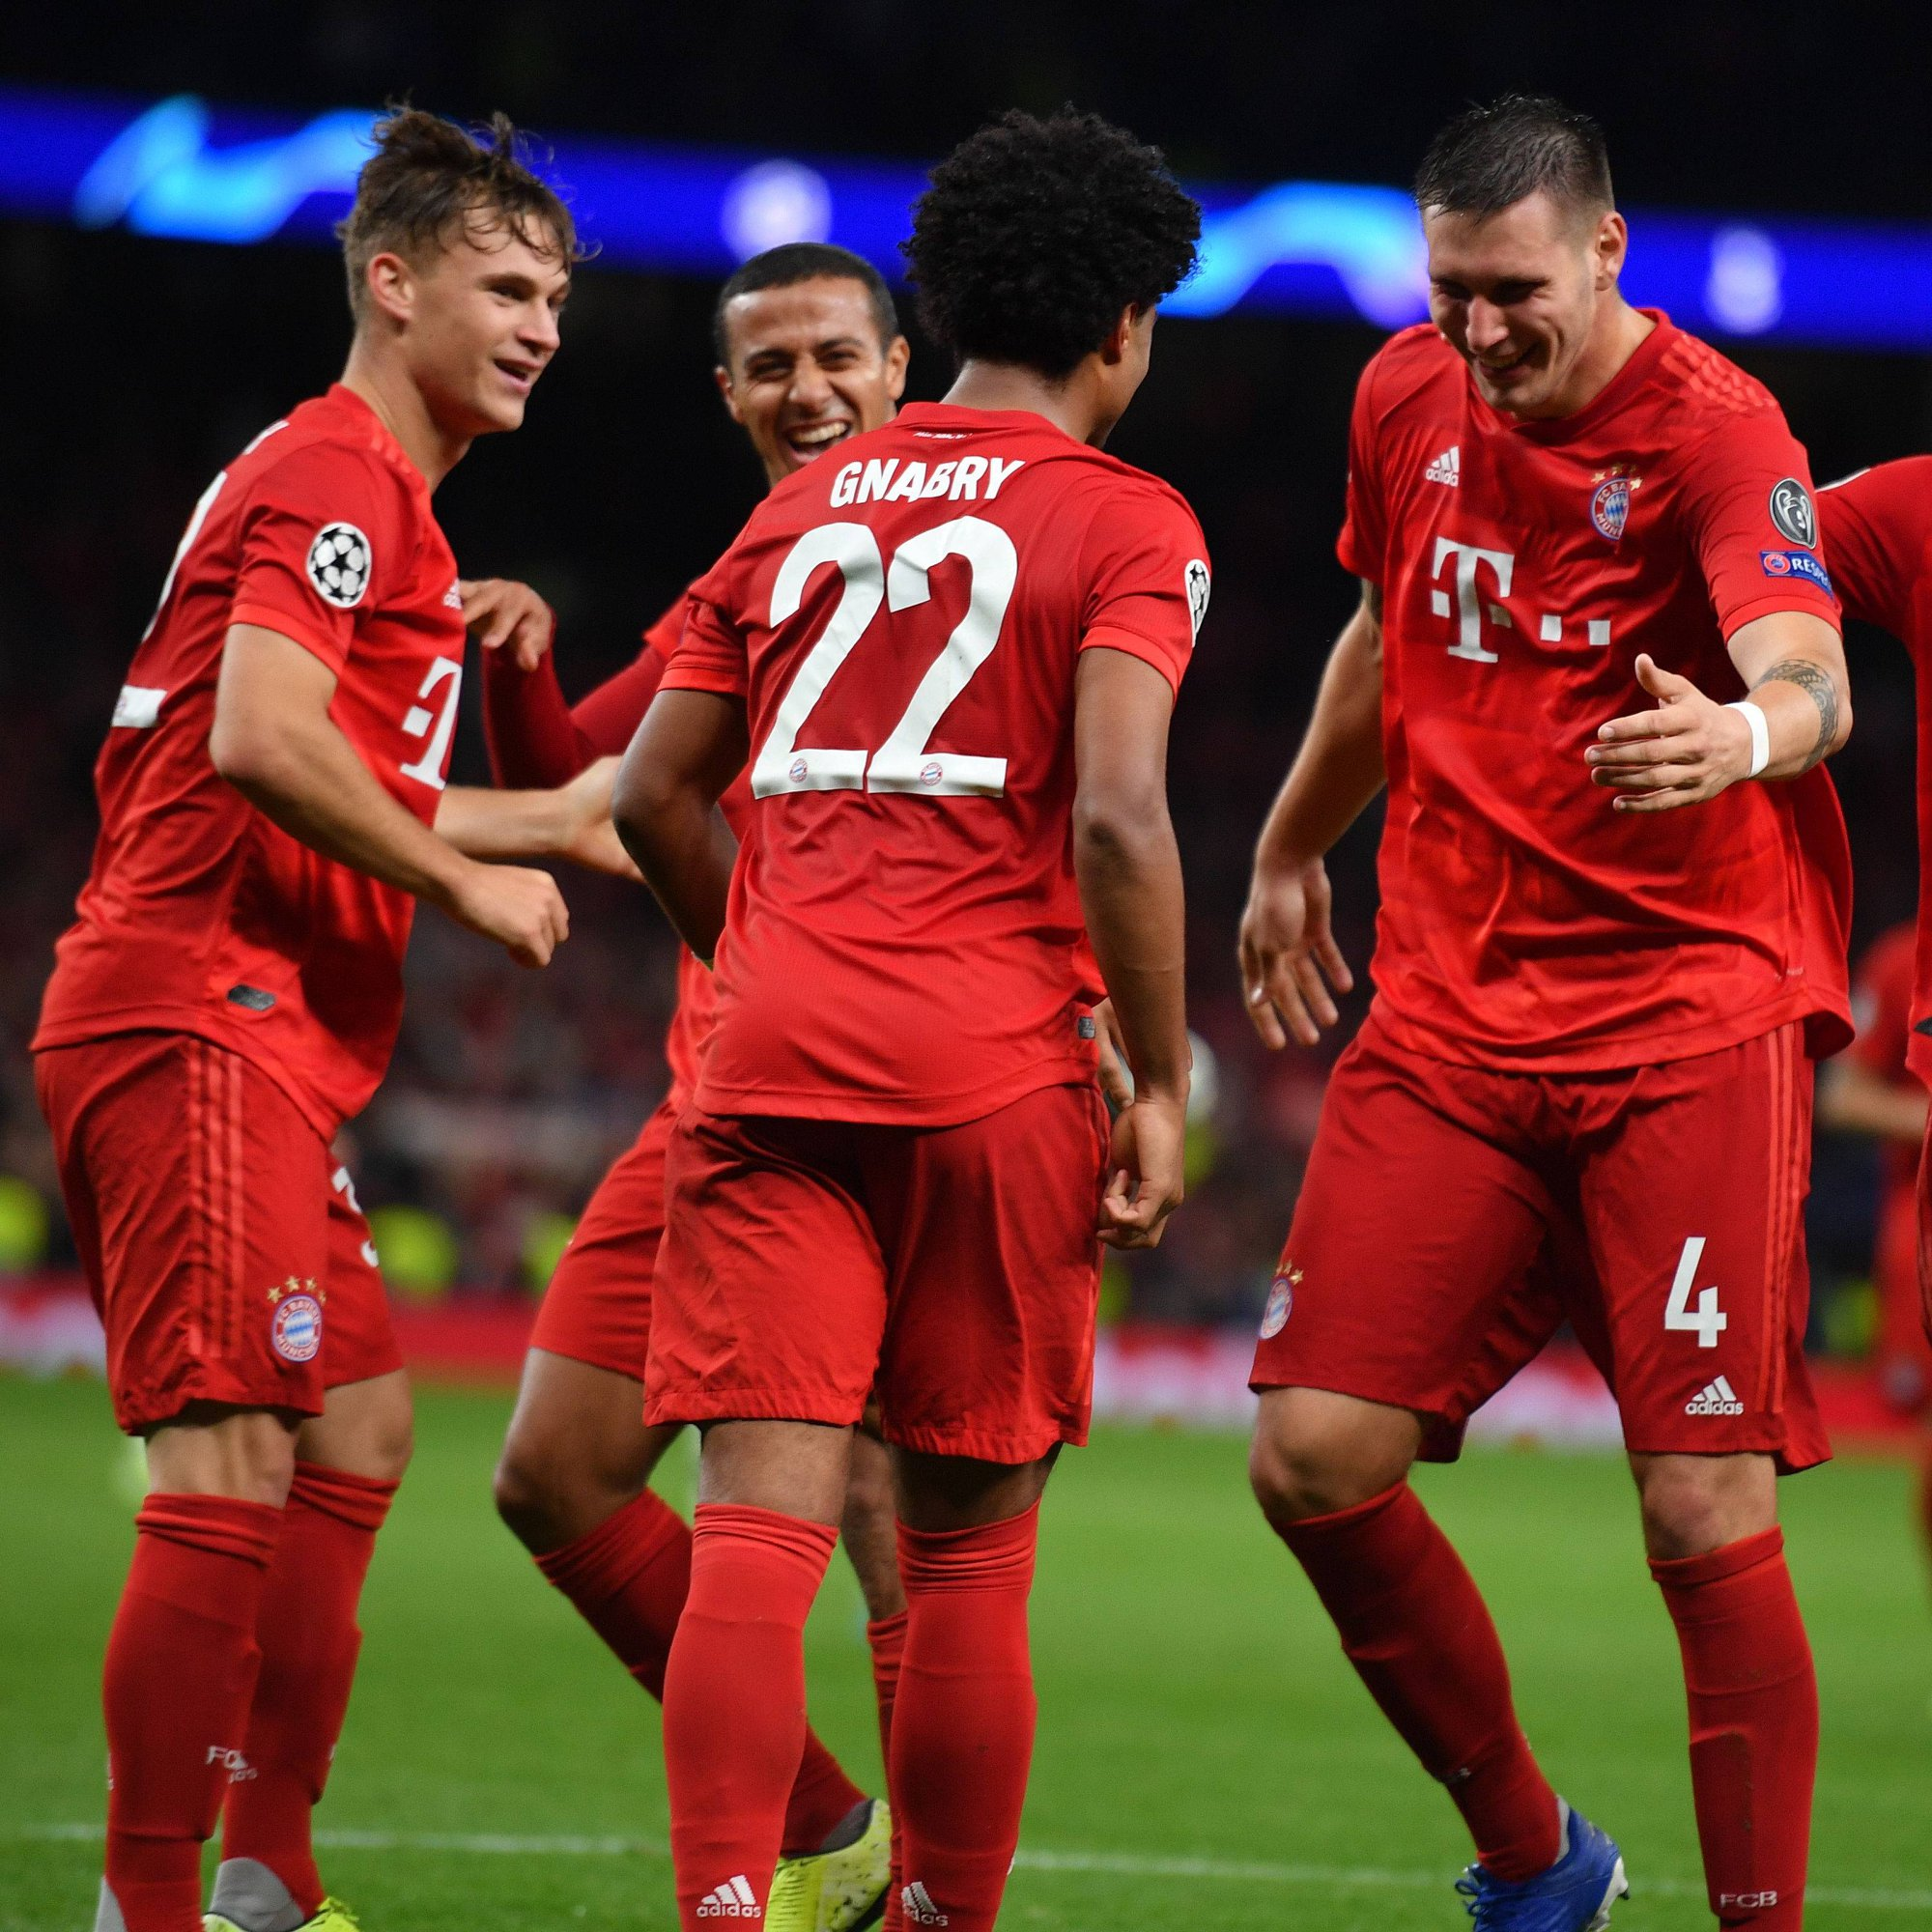 Le Bayern, premier de Bundesliga avec 4 points d'avance sur Dortmund.